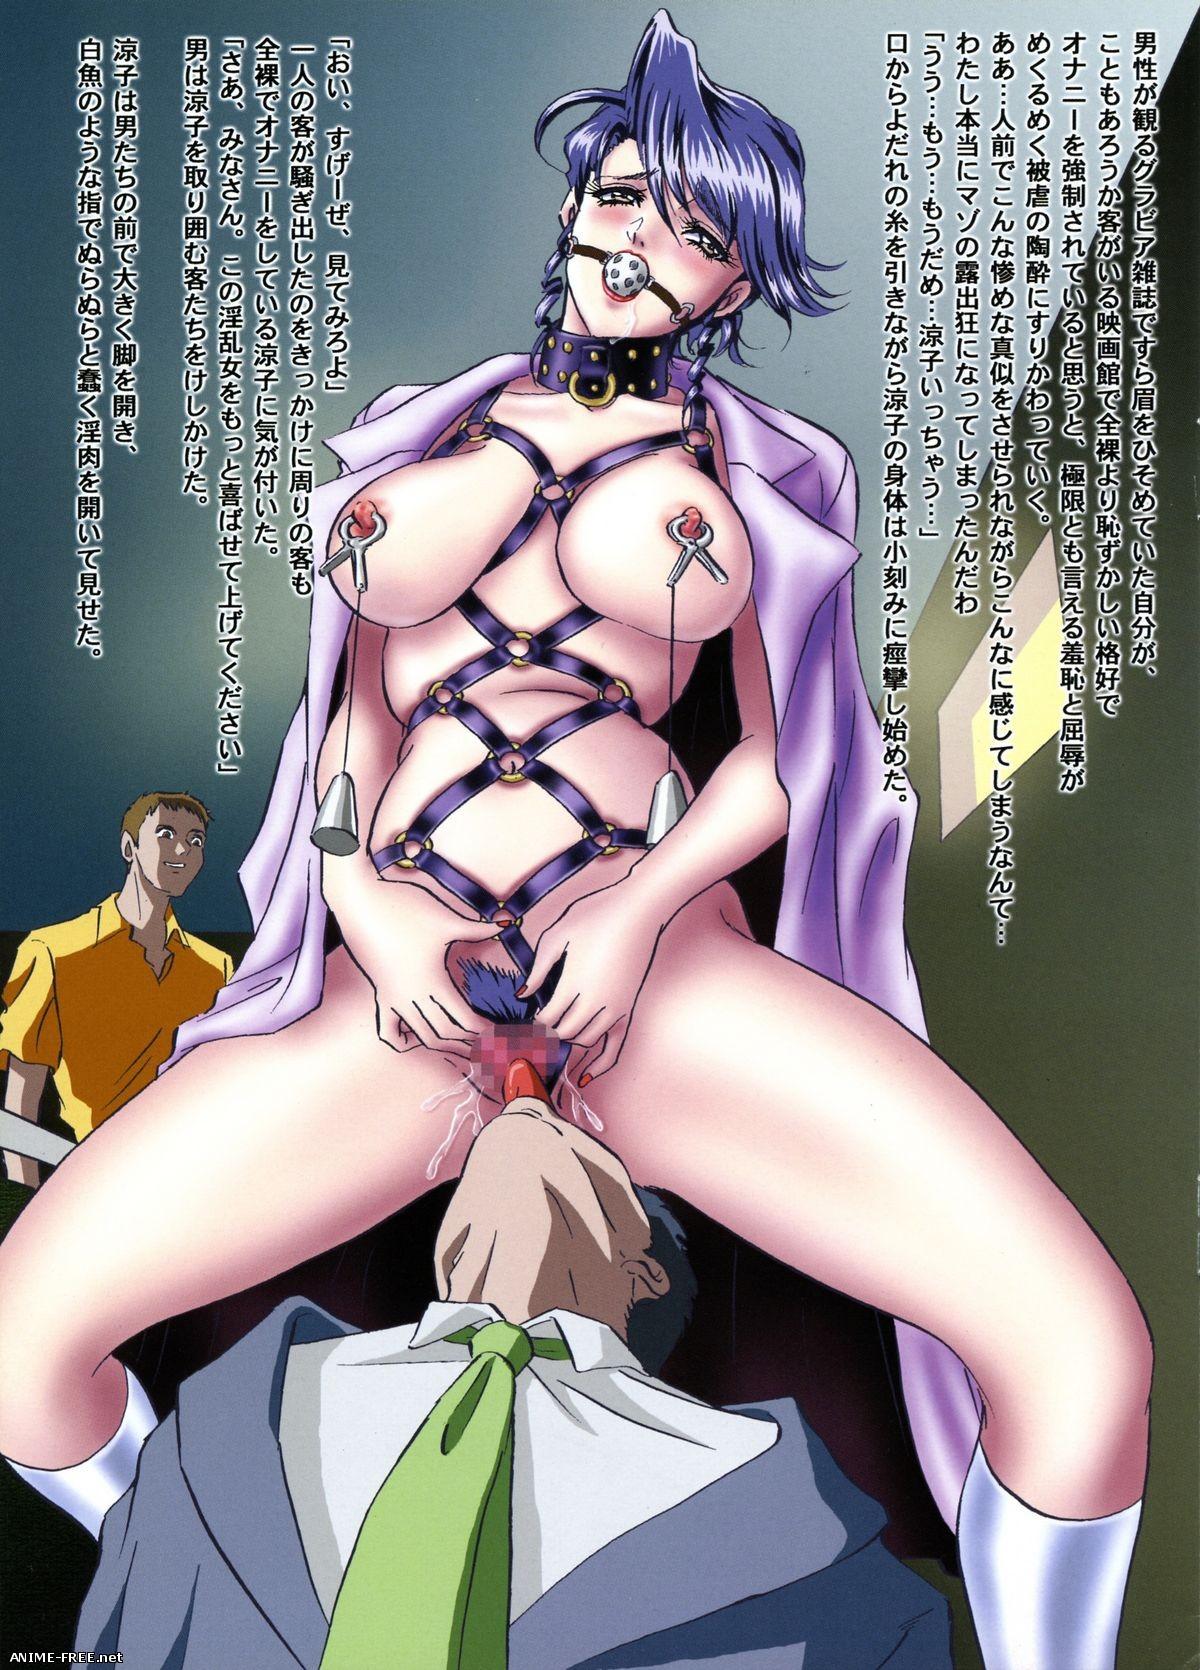 MON-MON / Koala Kikaku - Сборник хентай манги [Сen] [JAP,ENG] Manga Hentai